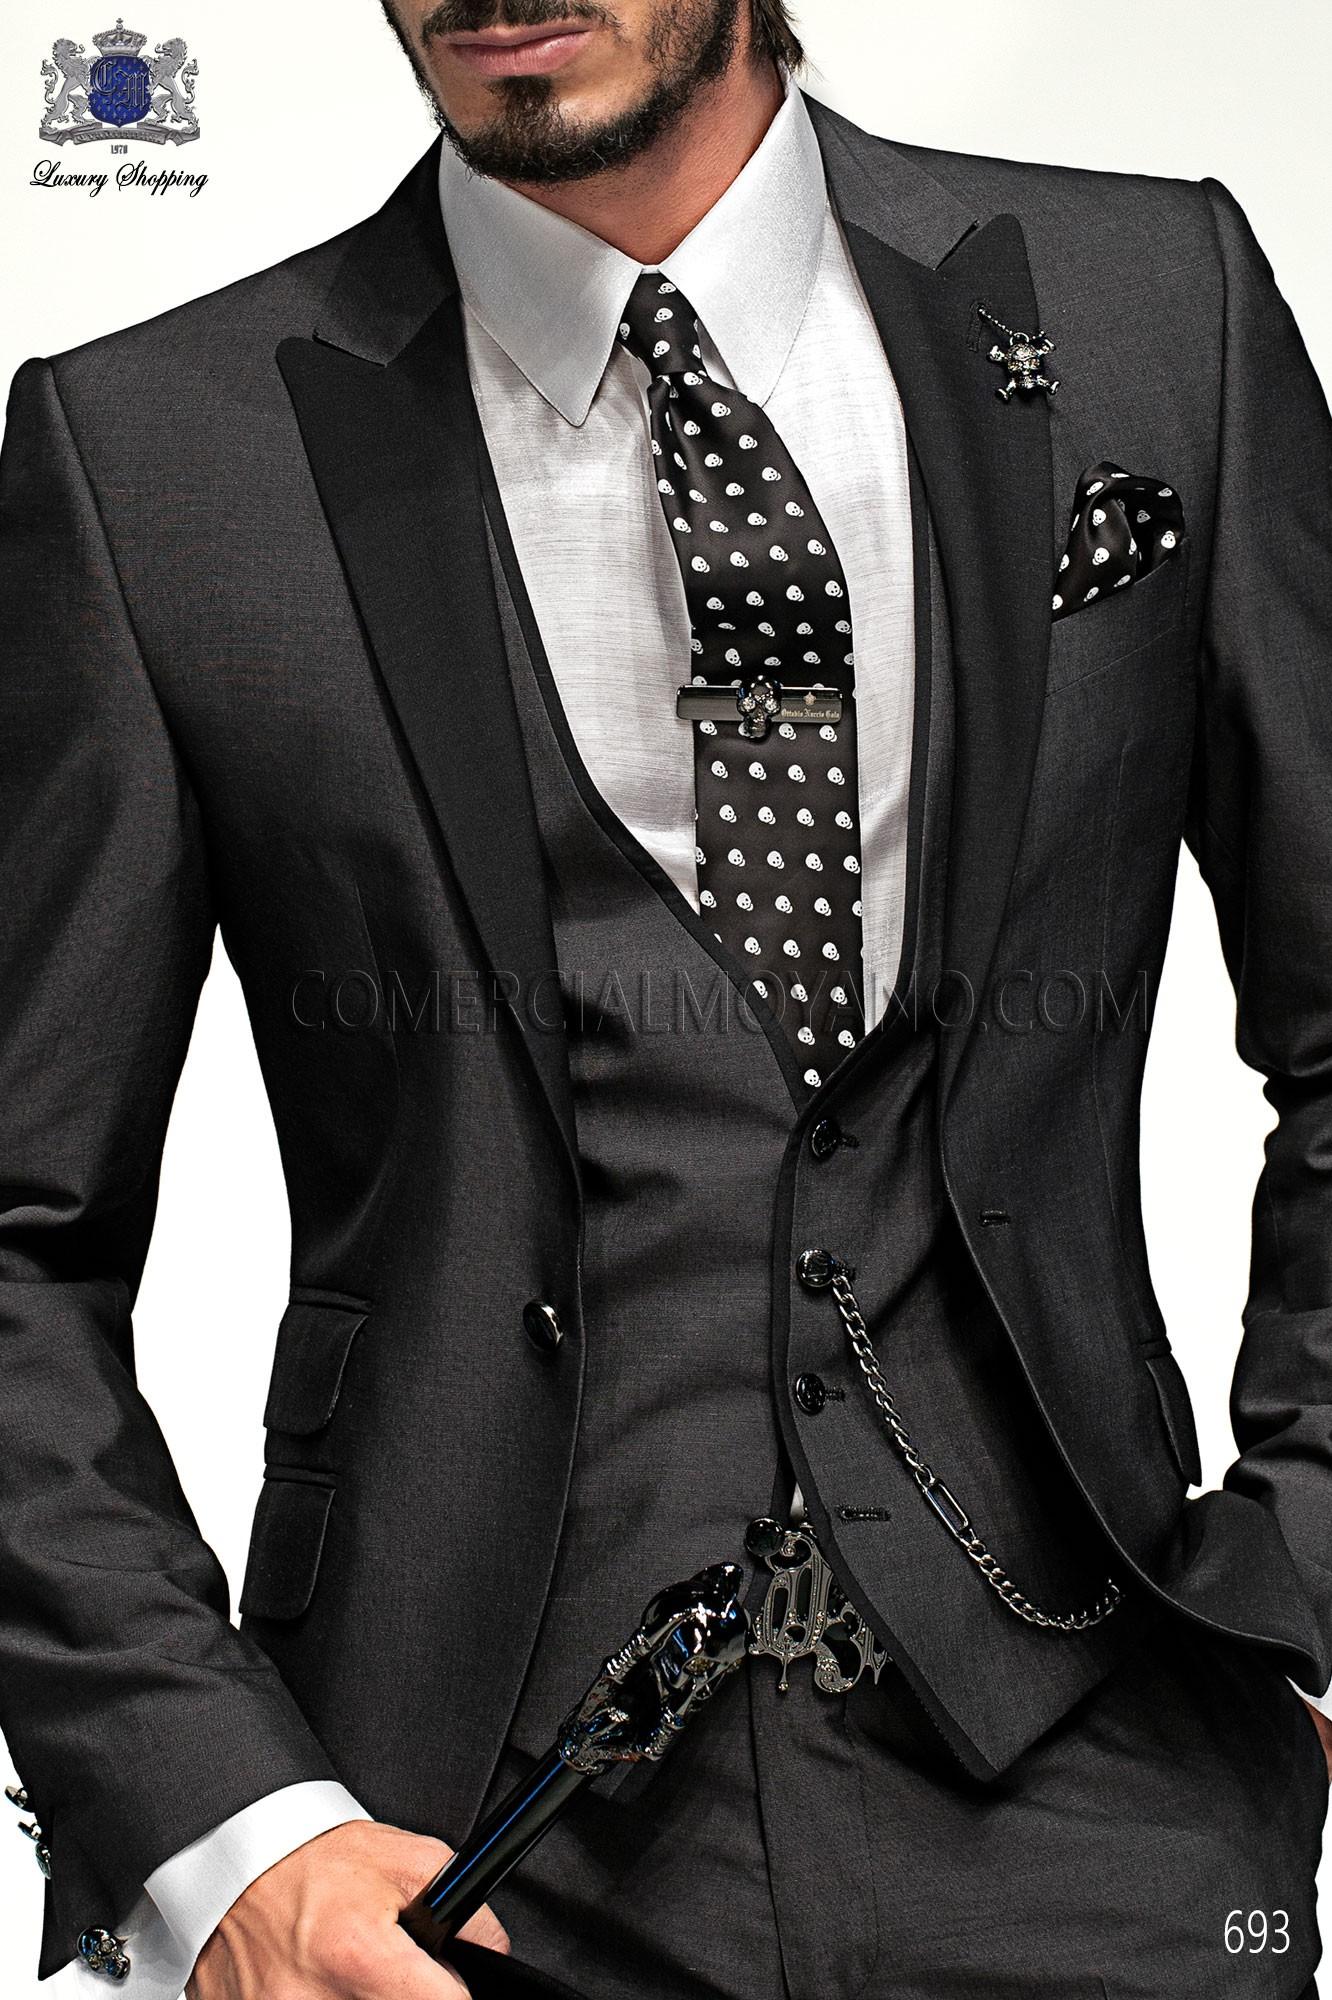 Mens Charcoal Wedding Suits - Unique Wedding Ideas